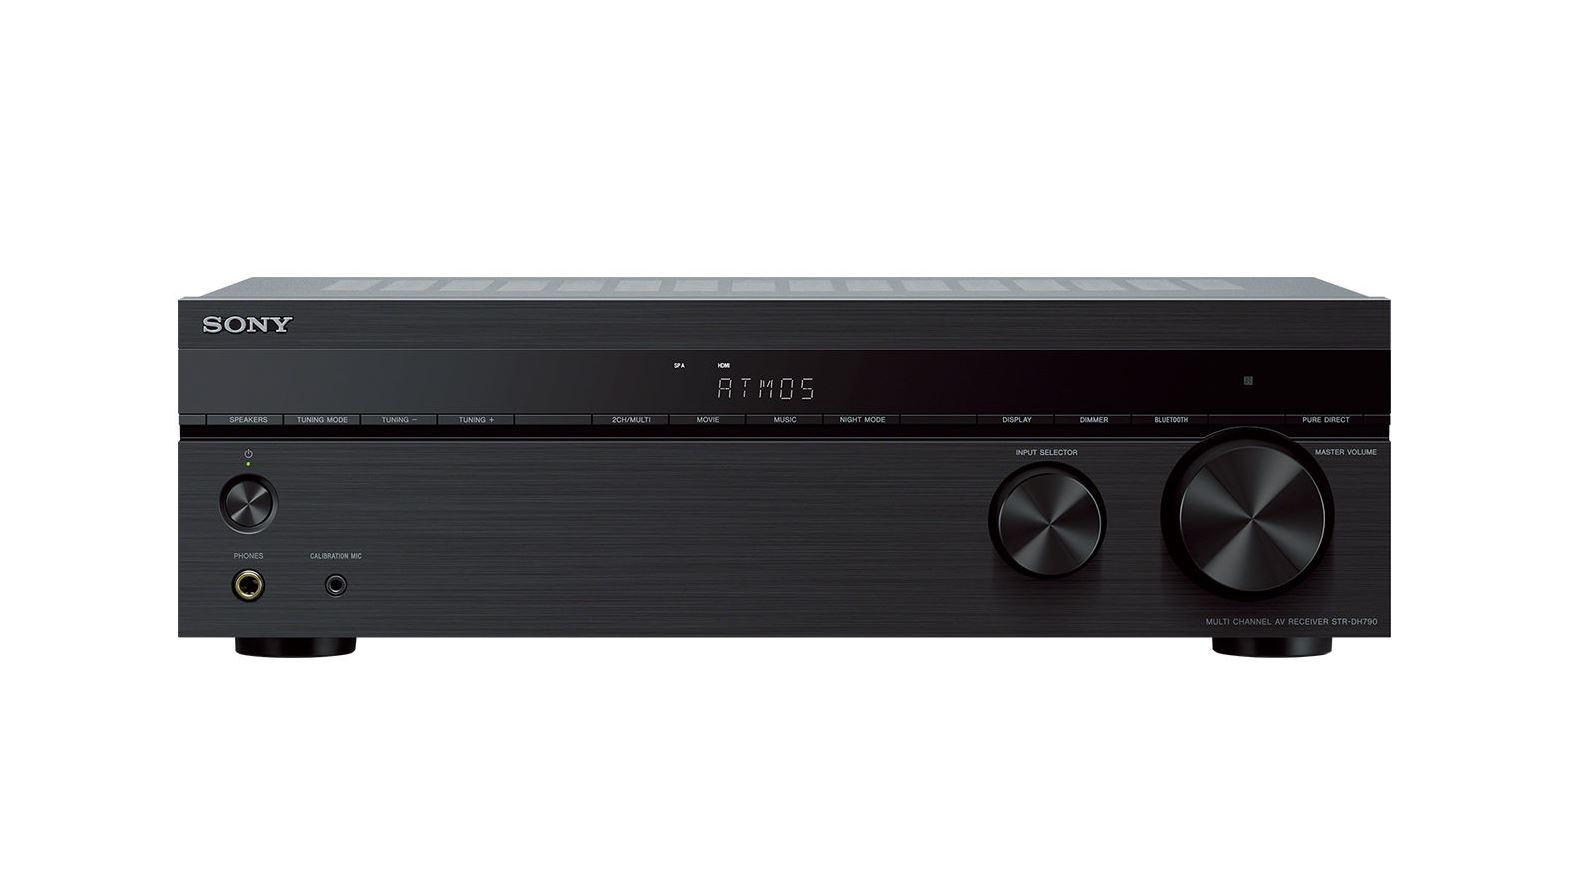 Sony STR-DH790 AV Receiver Review